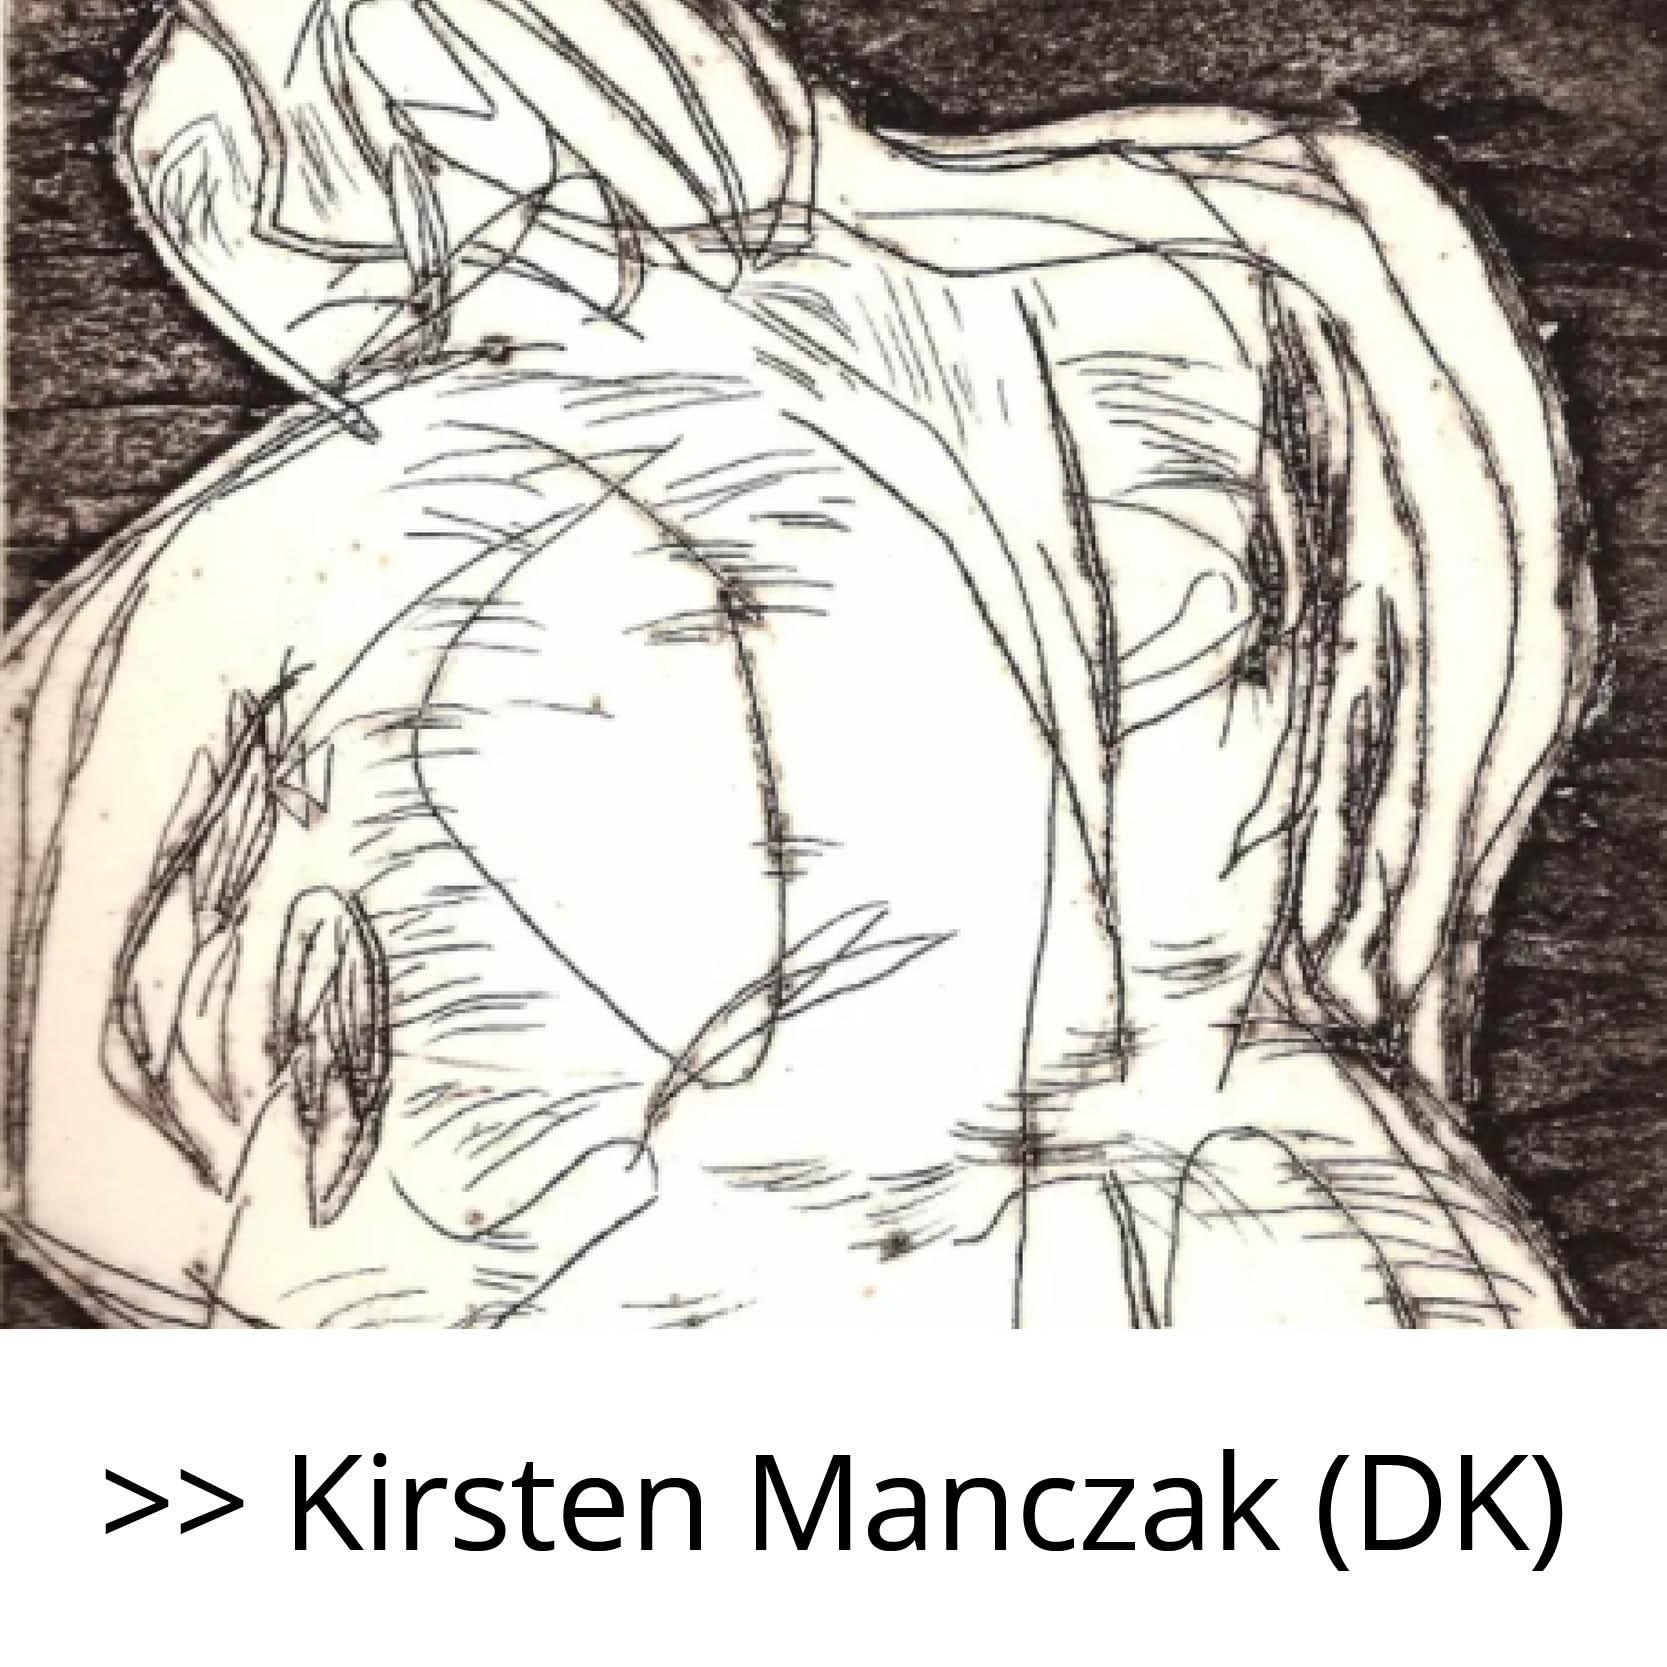 Kirsten_Manczak_(DK)